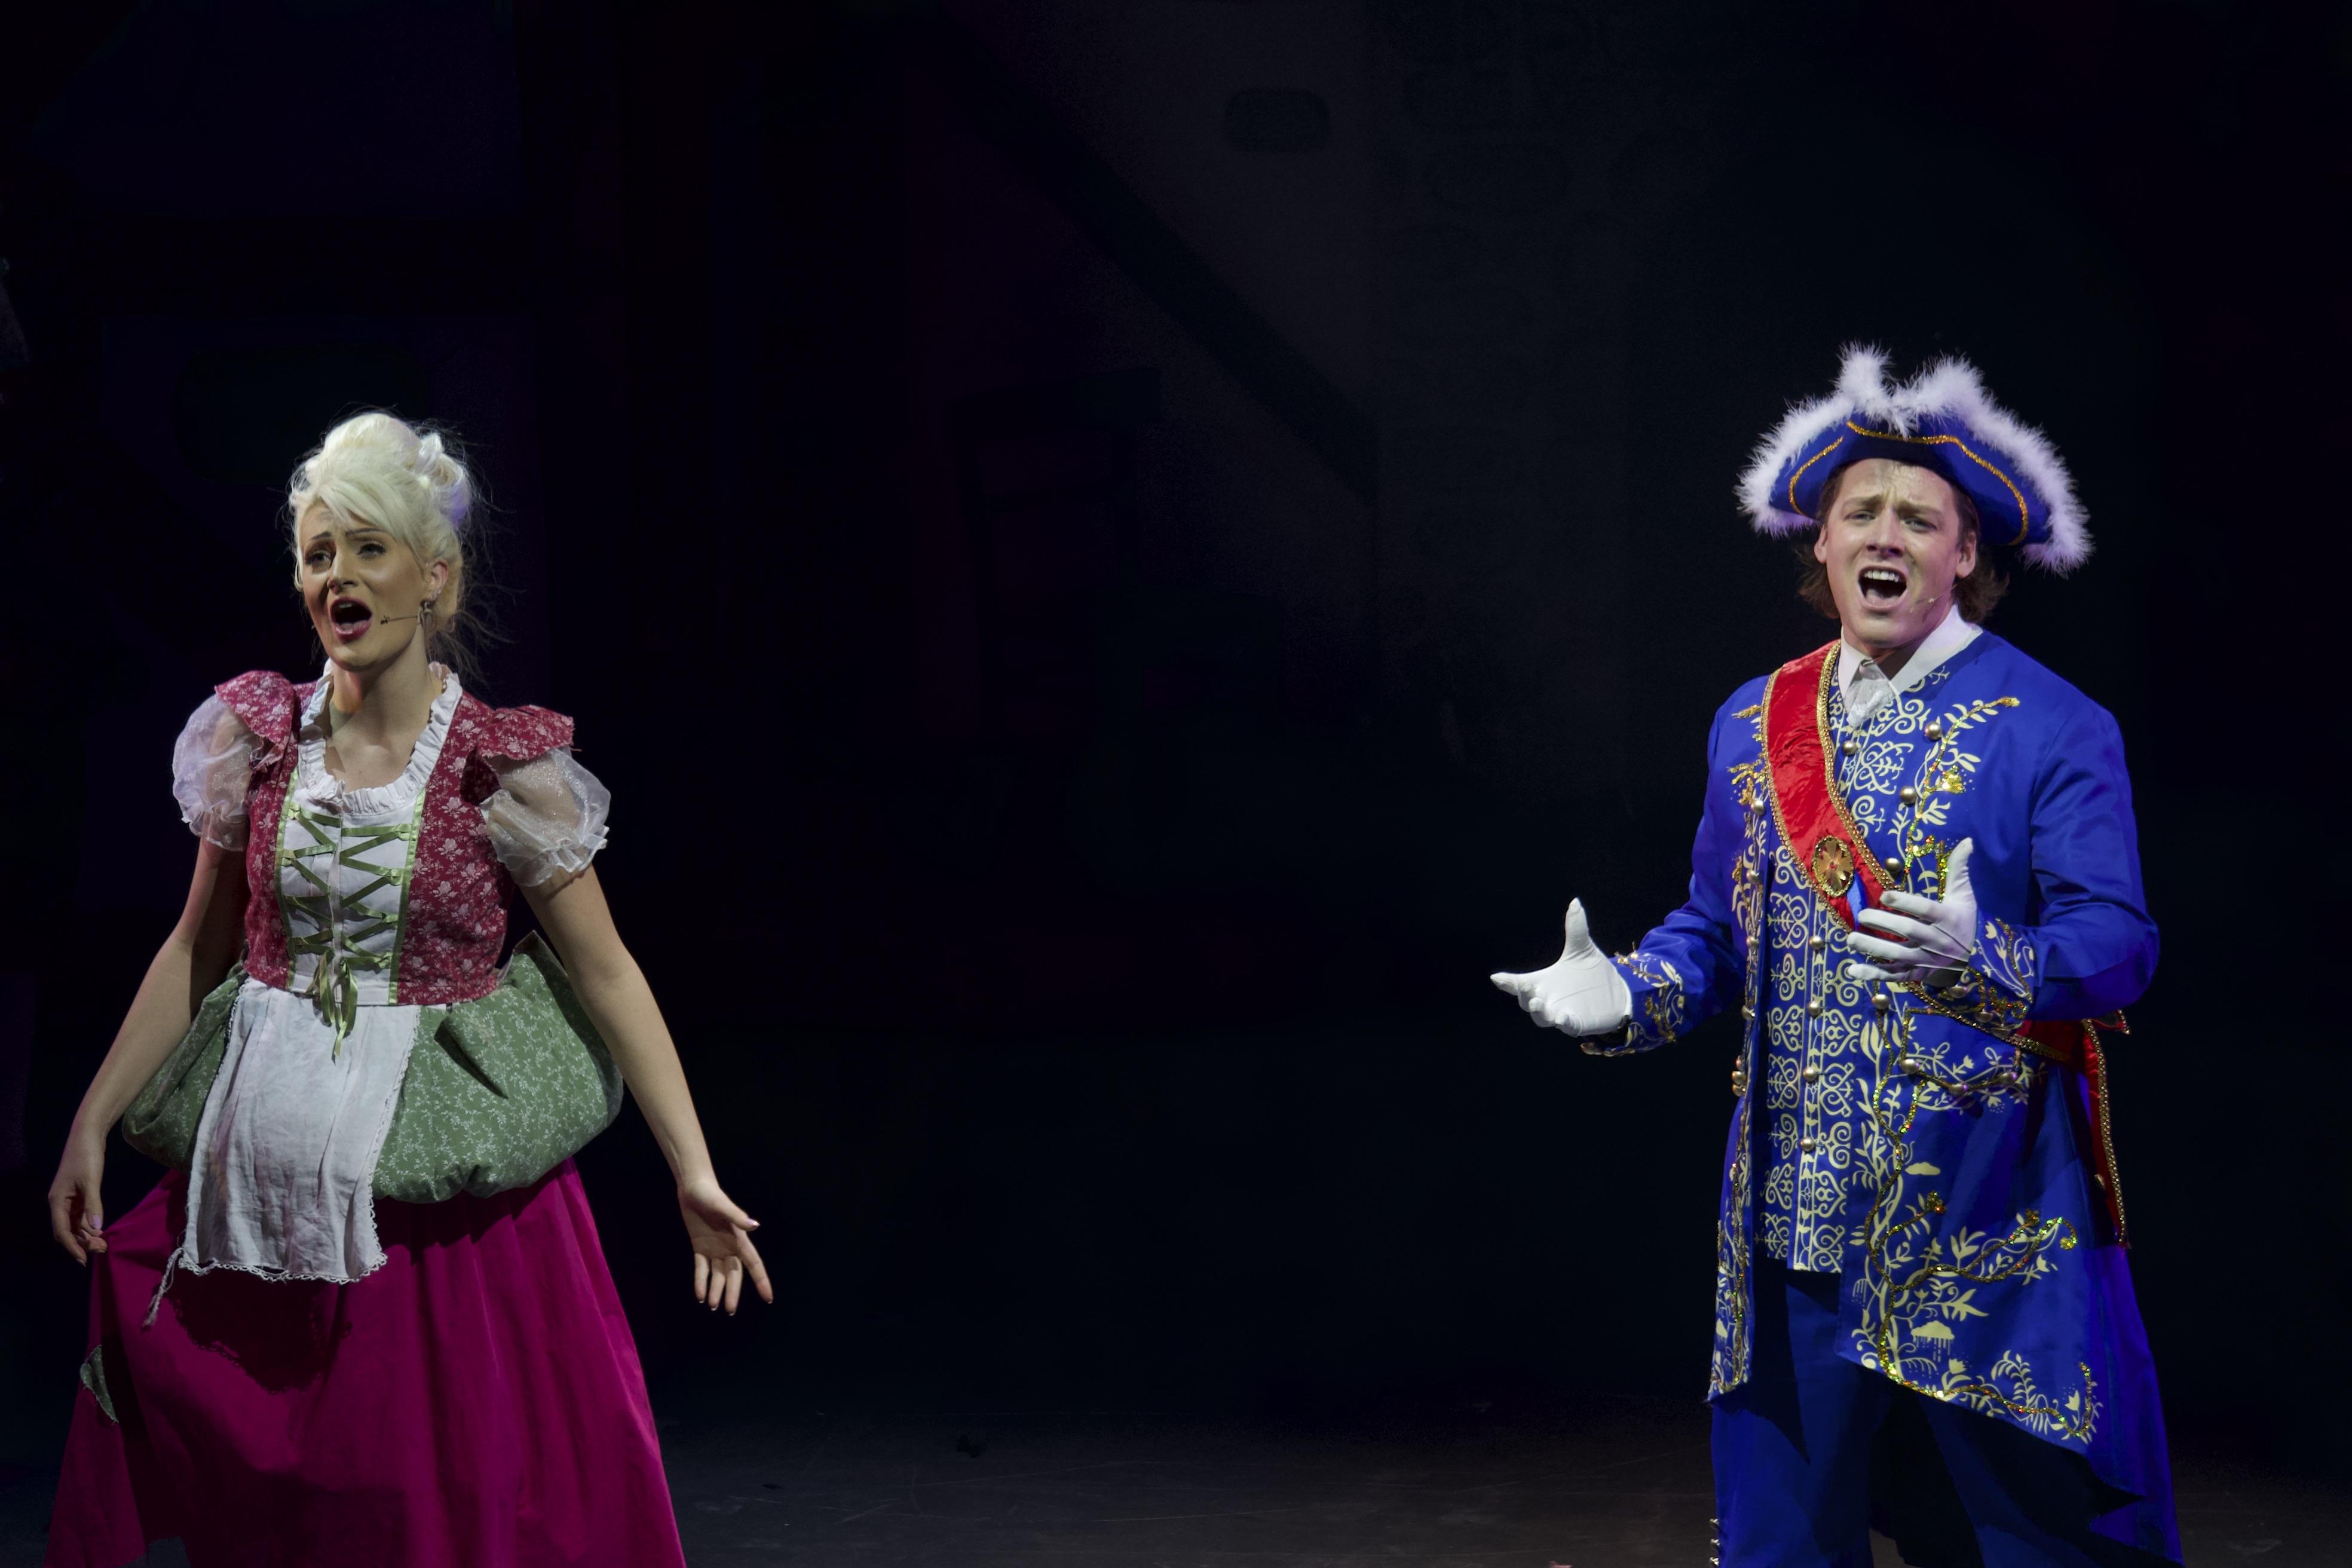 Cinders & Prince Charming